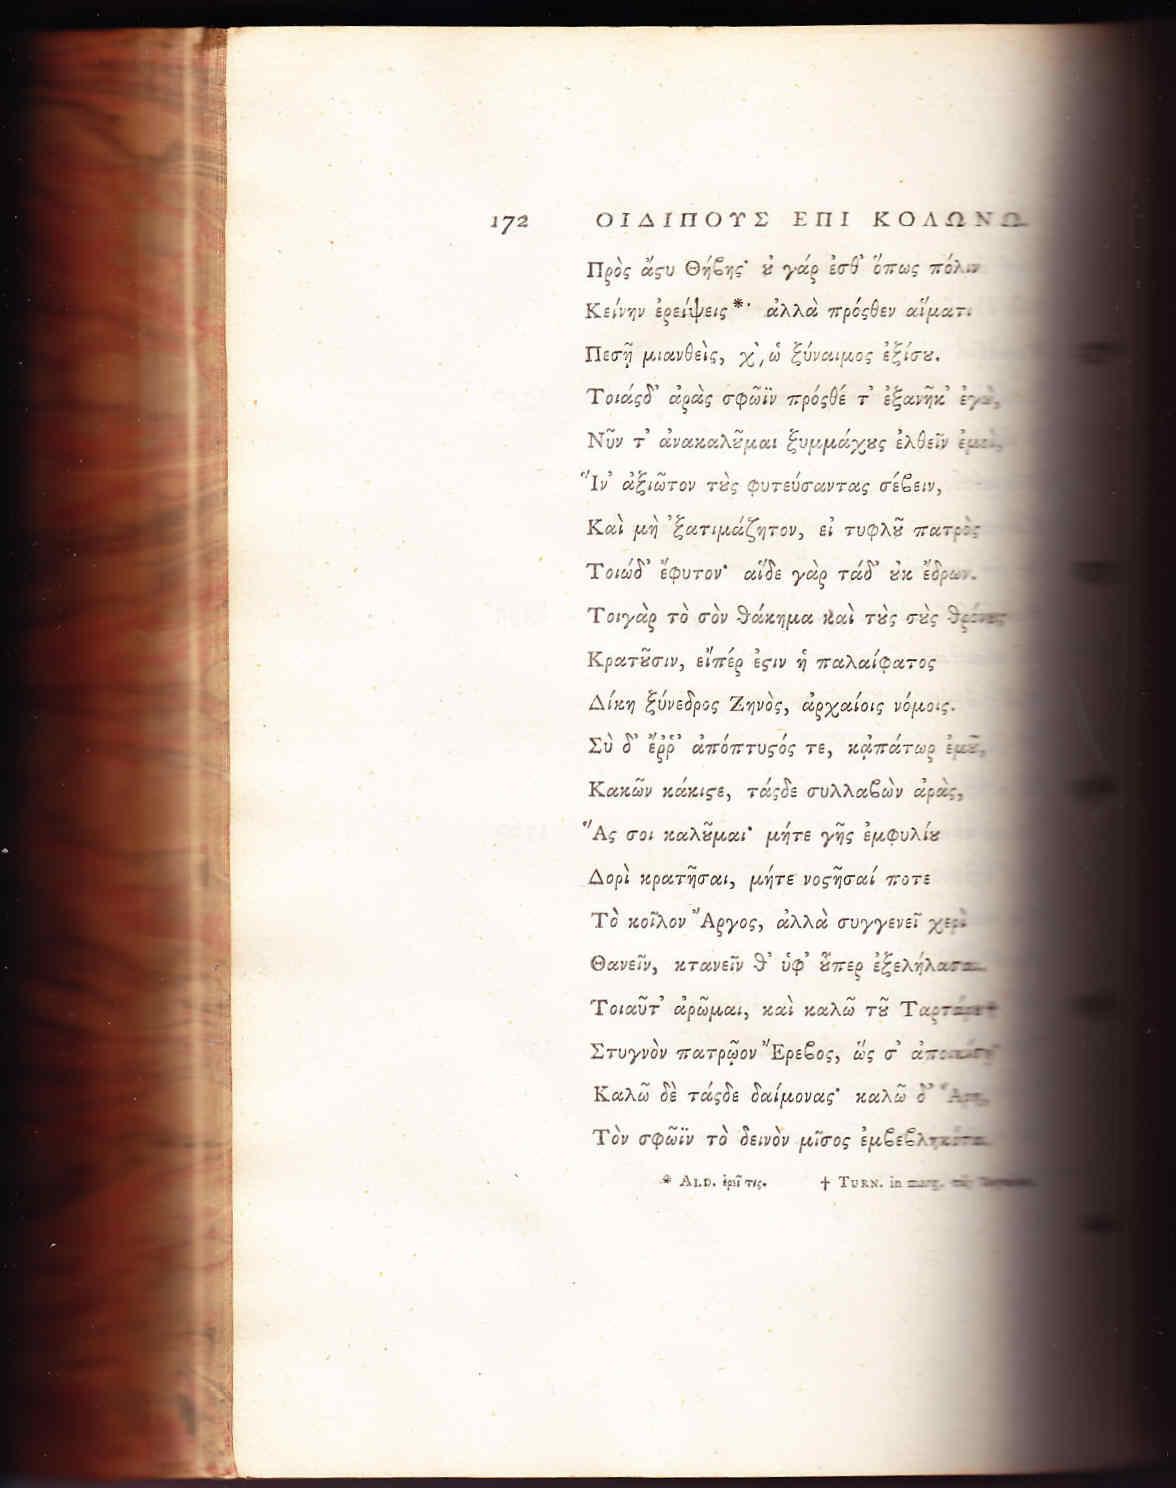 Restauración de libro antiguo y Sófocles terminado